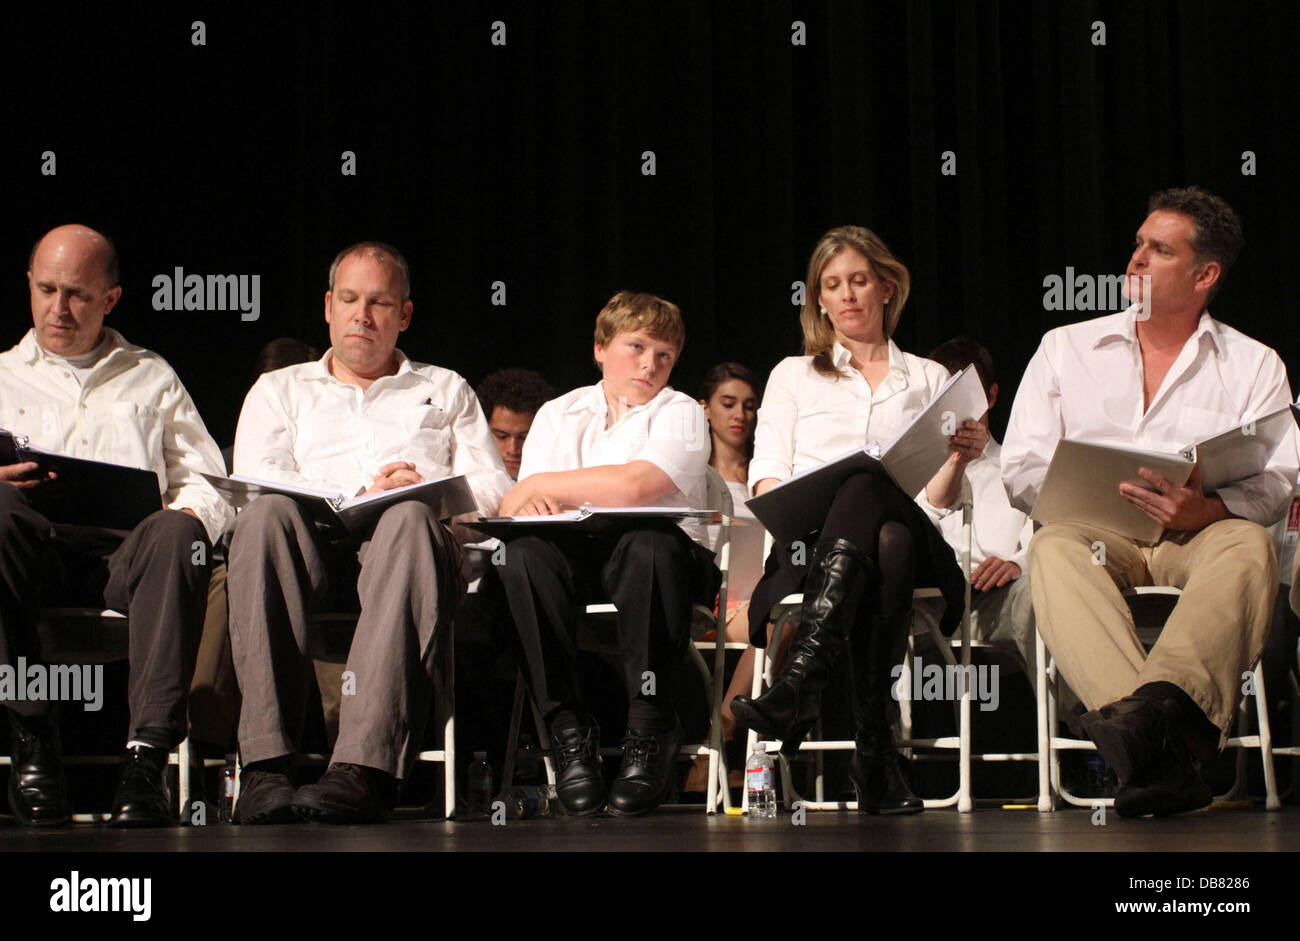 Robert Watzke, Zane Amundsen, Helen Slater and David Humphrey 'The Road To Freedom' live audience stage - Stock Image